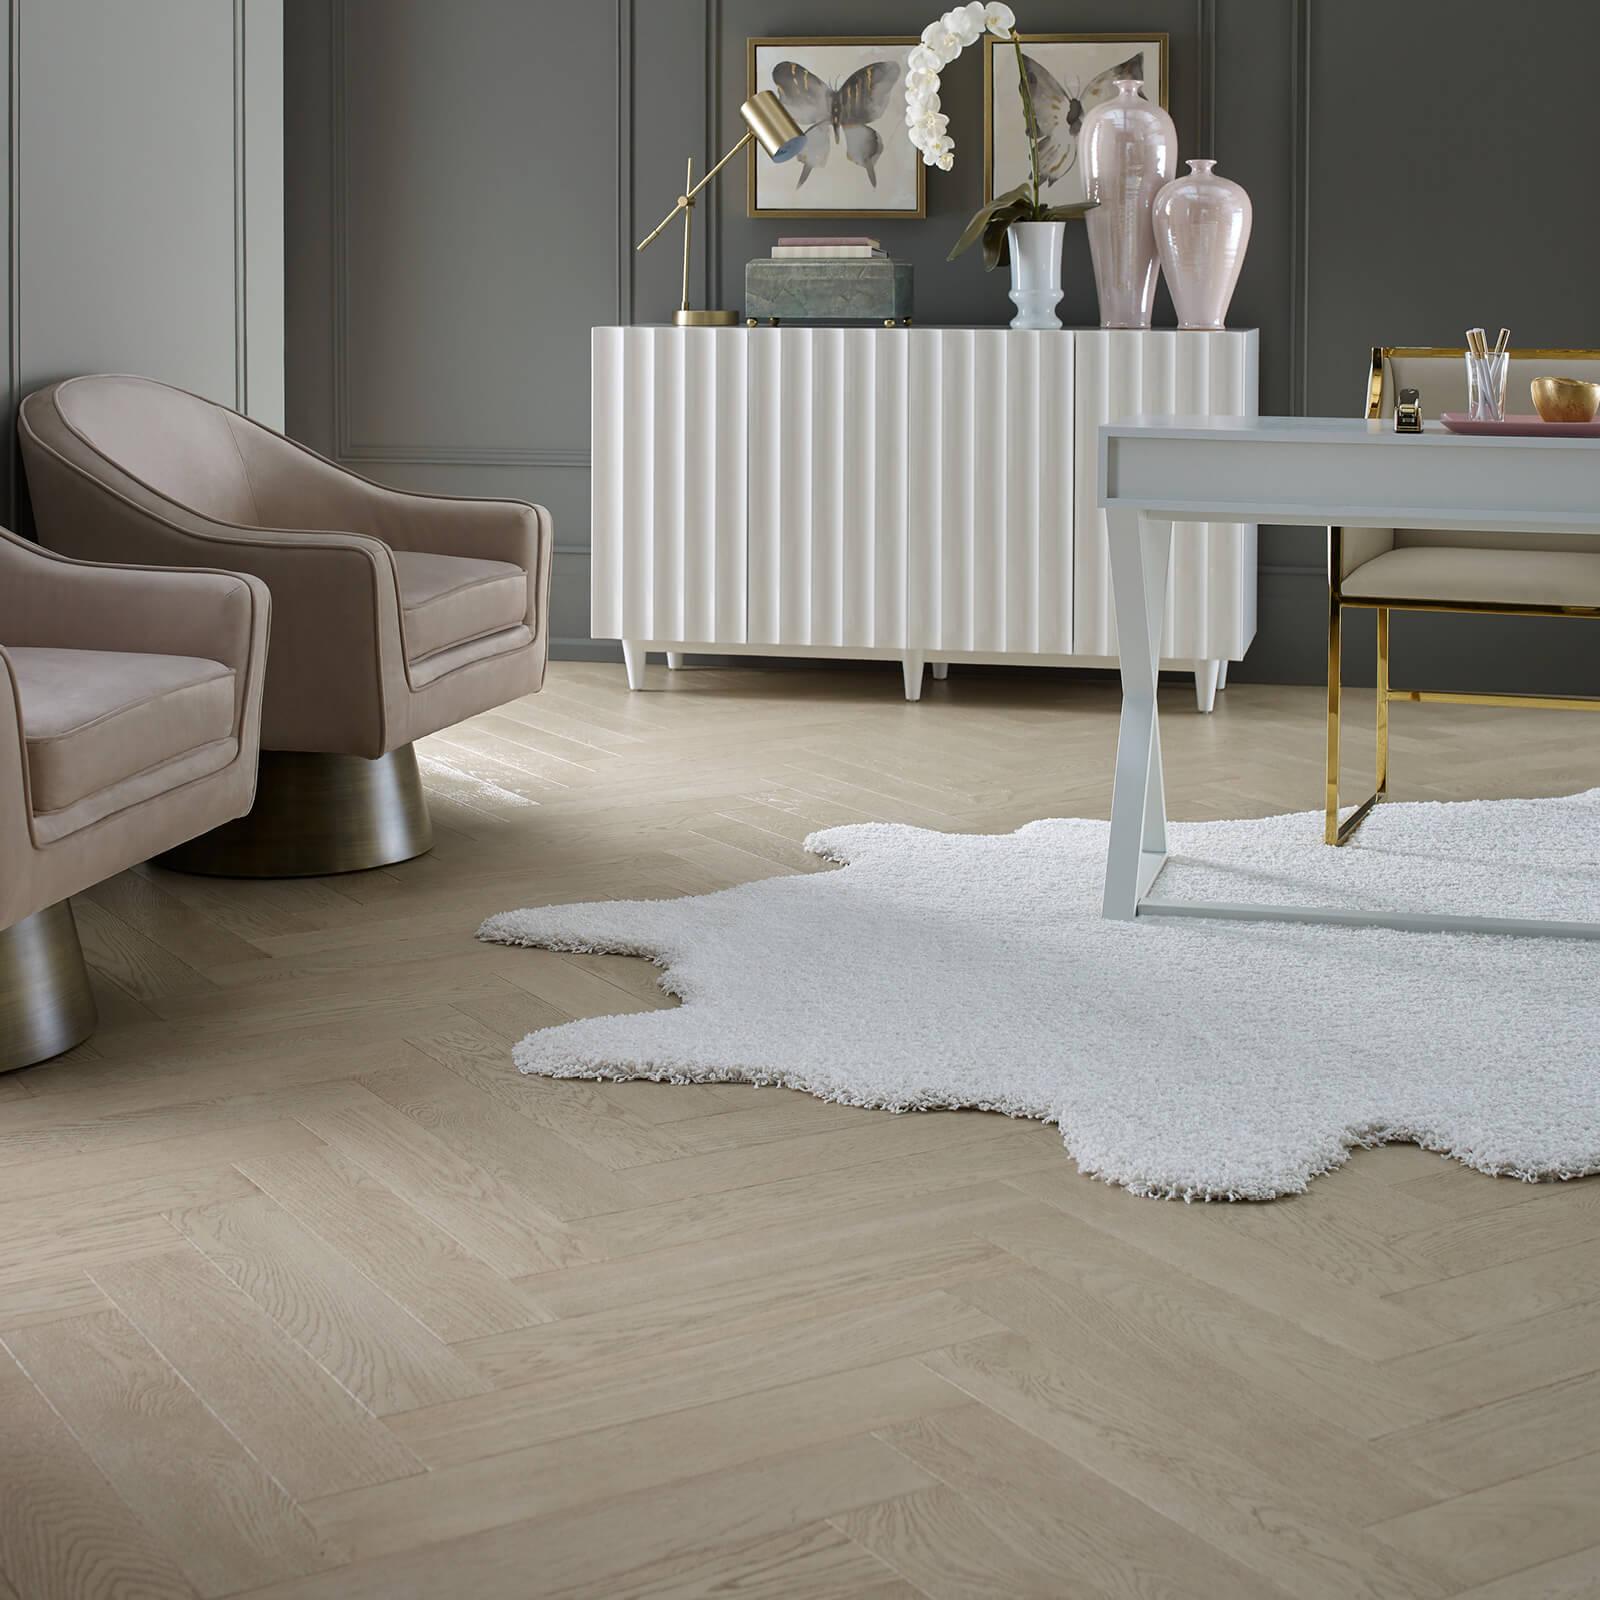 Fifth avenue Oak flooring | Flooring by Wilson's Carpet Plus